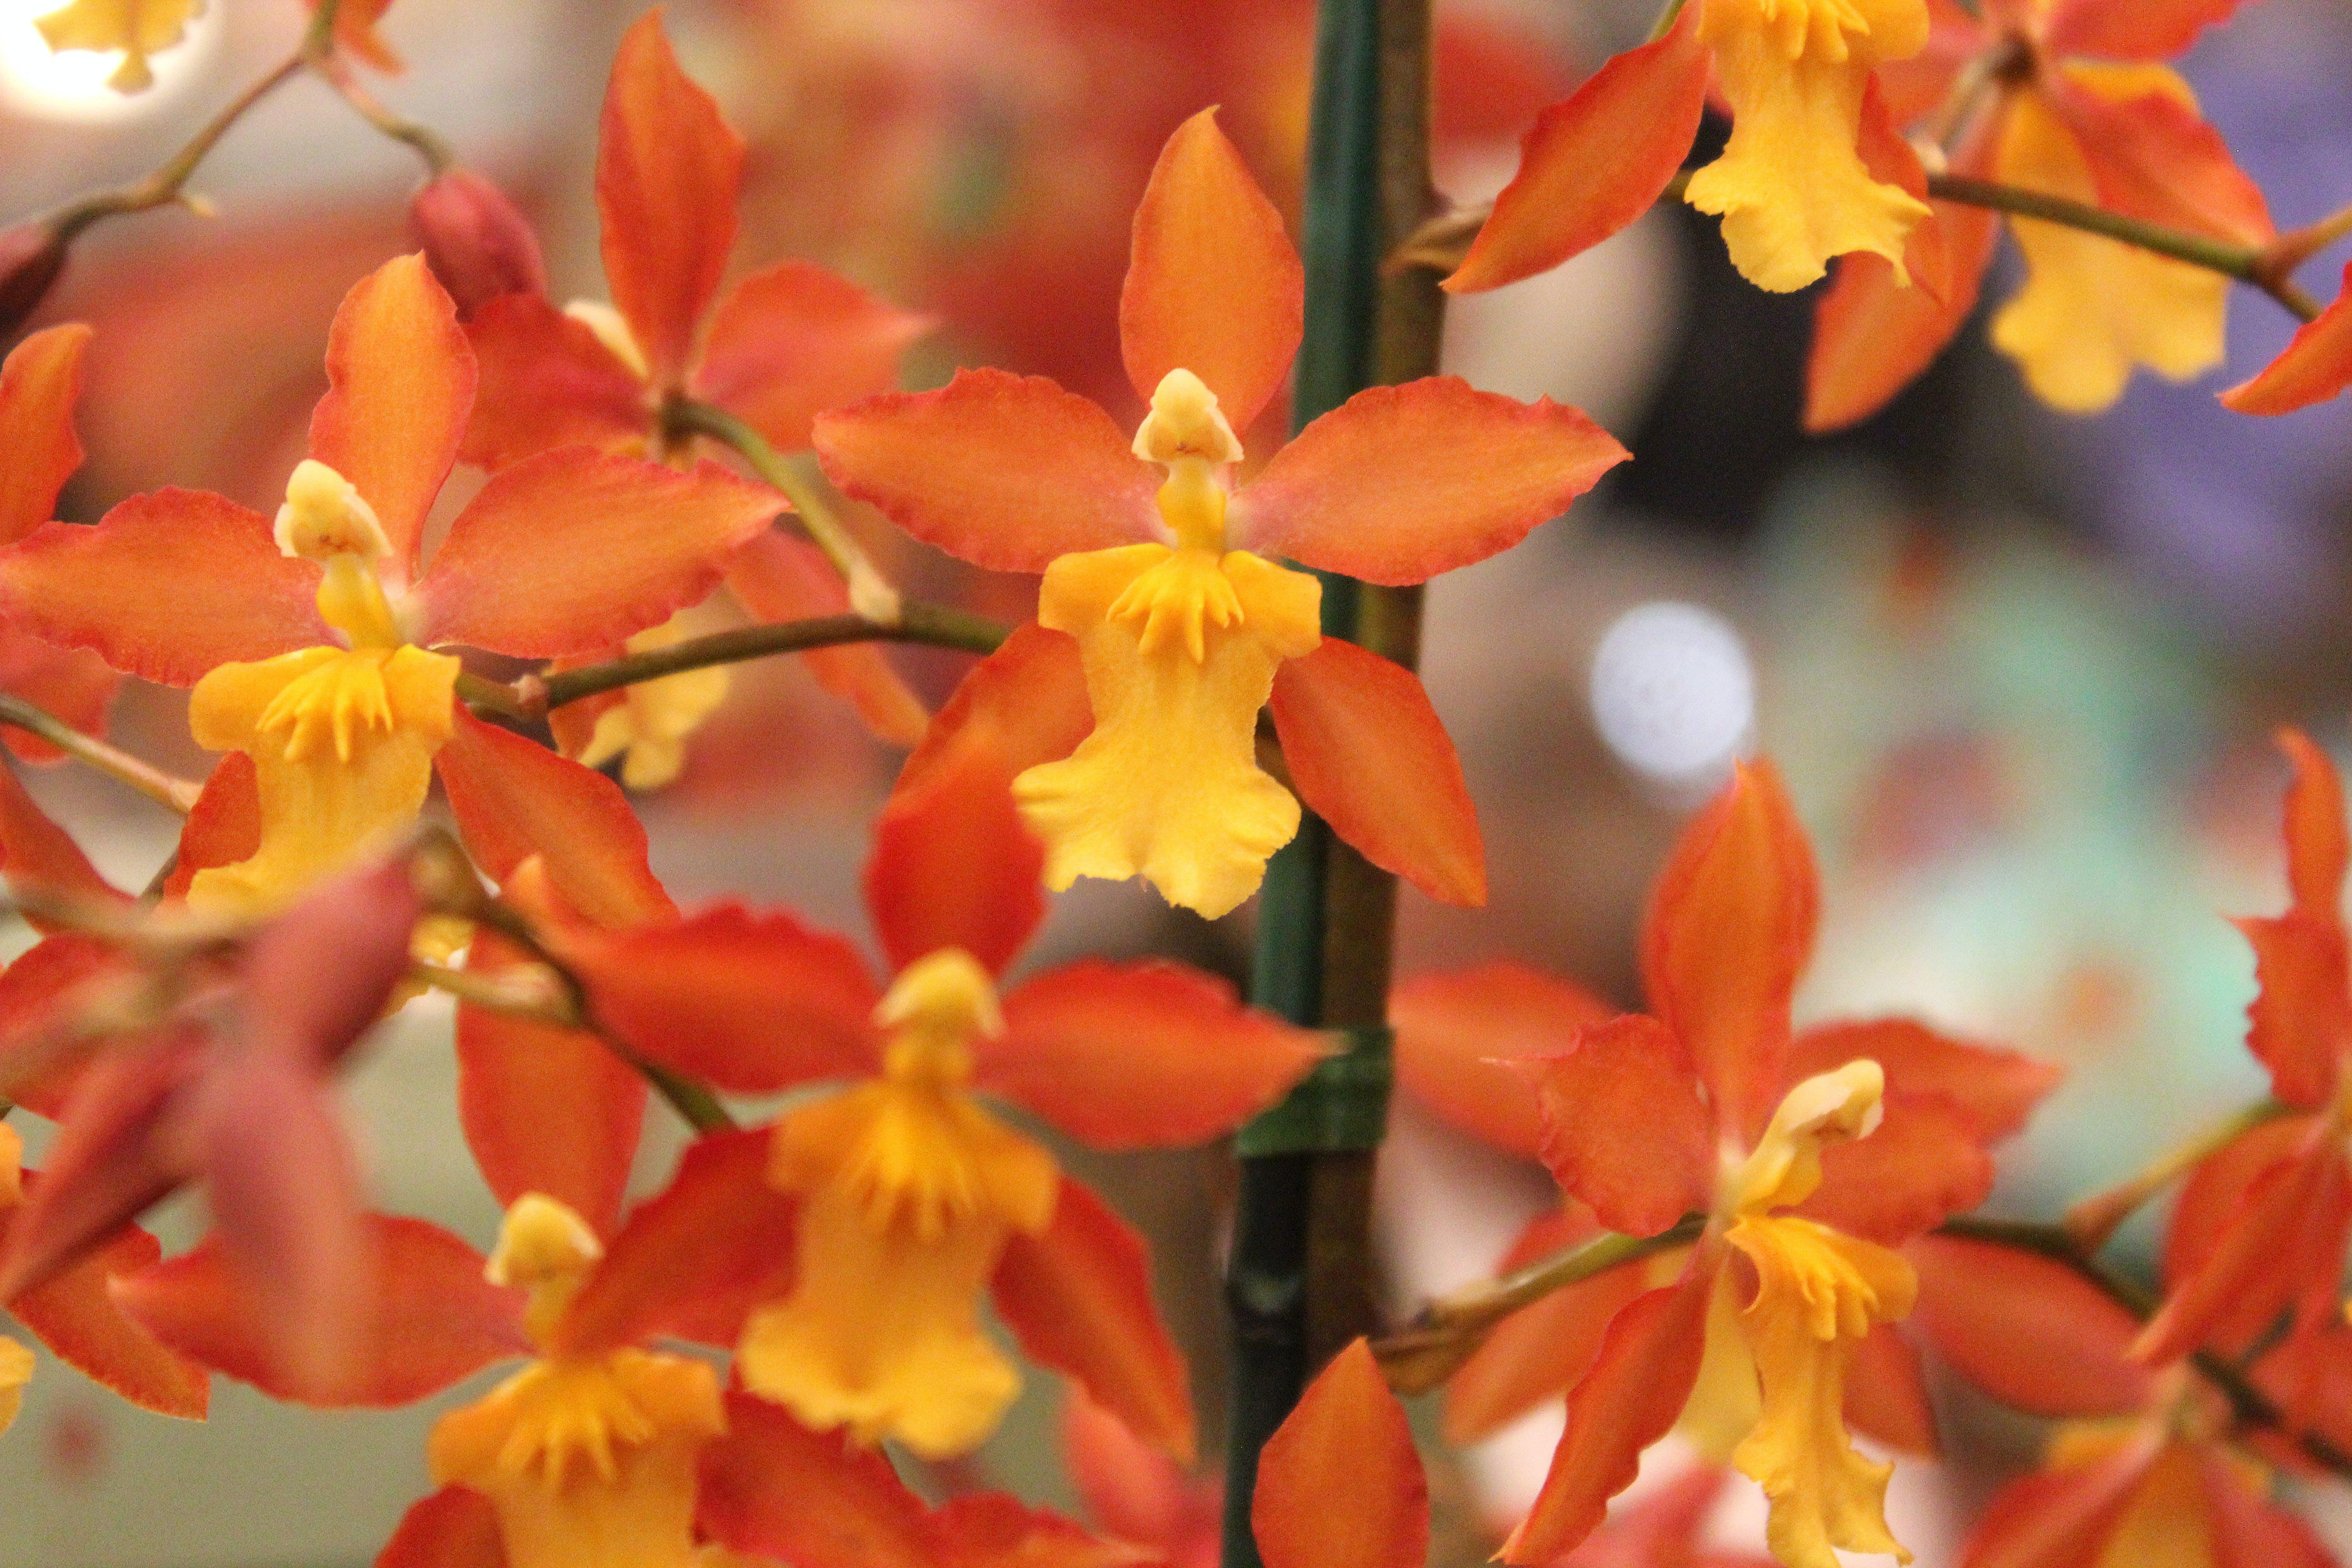 Free stock photo of orange flowers